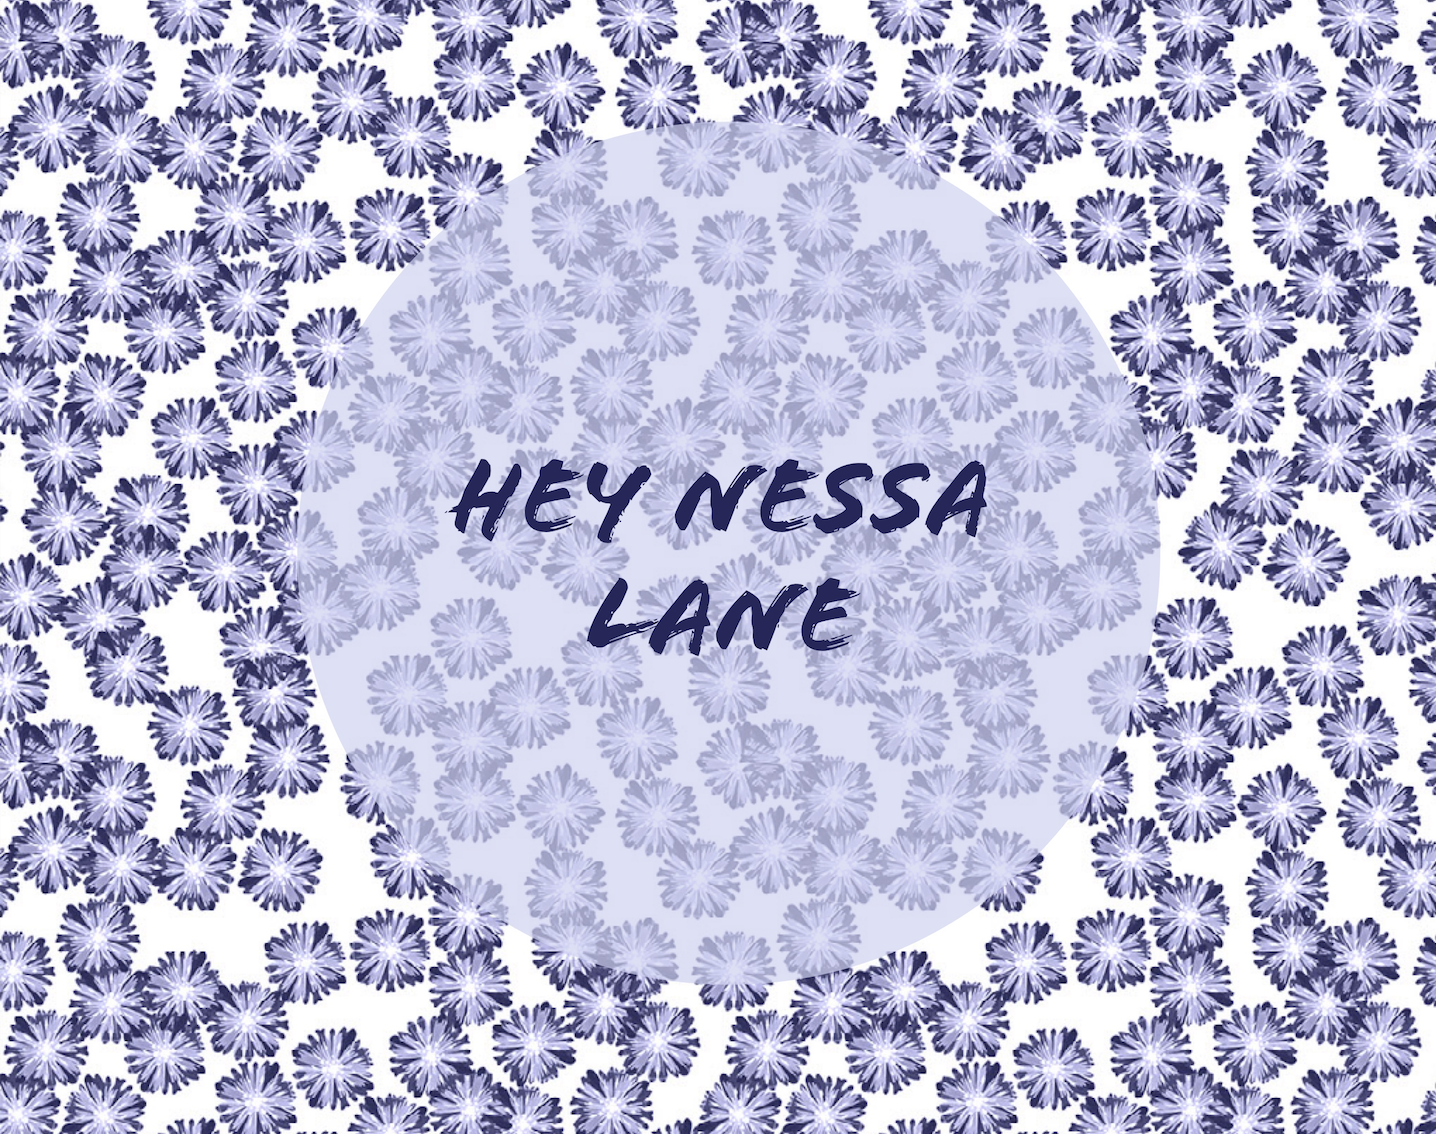 Hey Nessa Lane